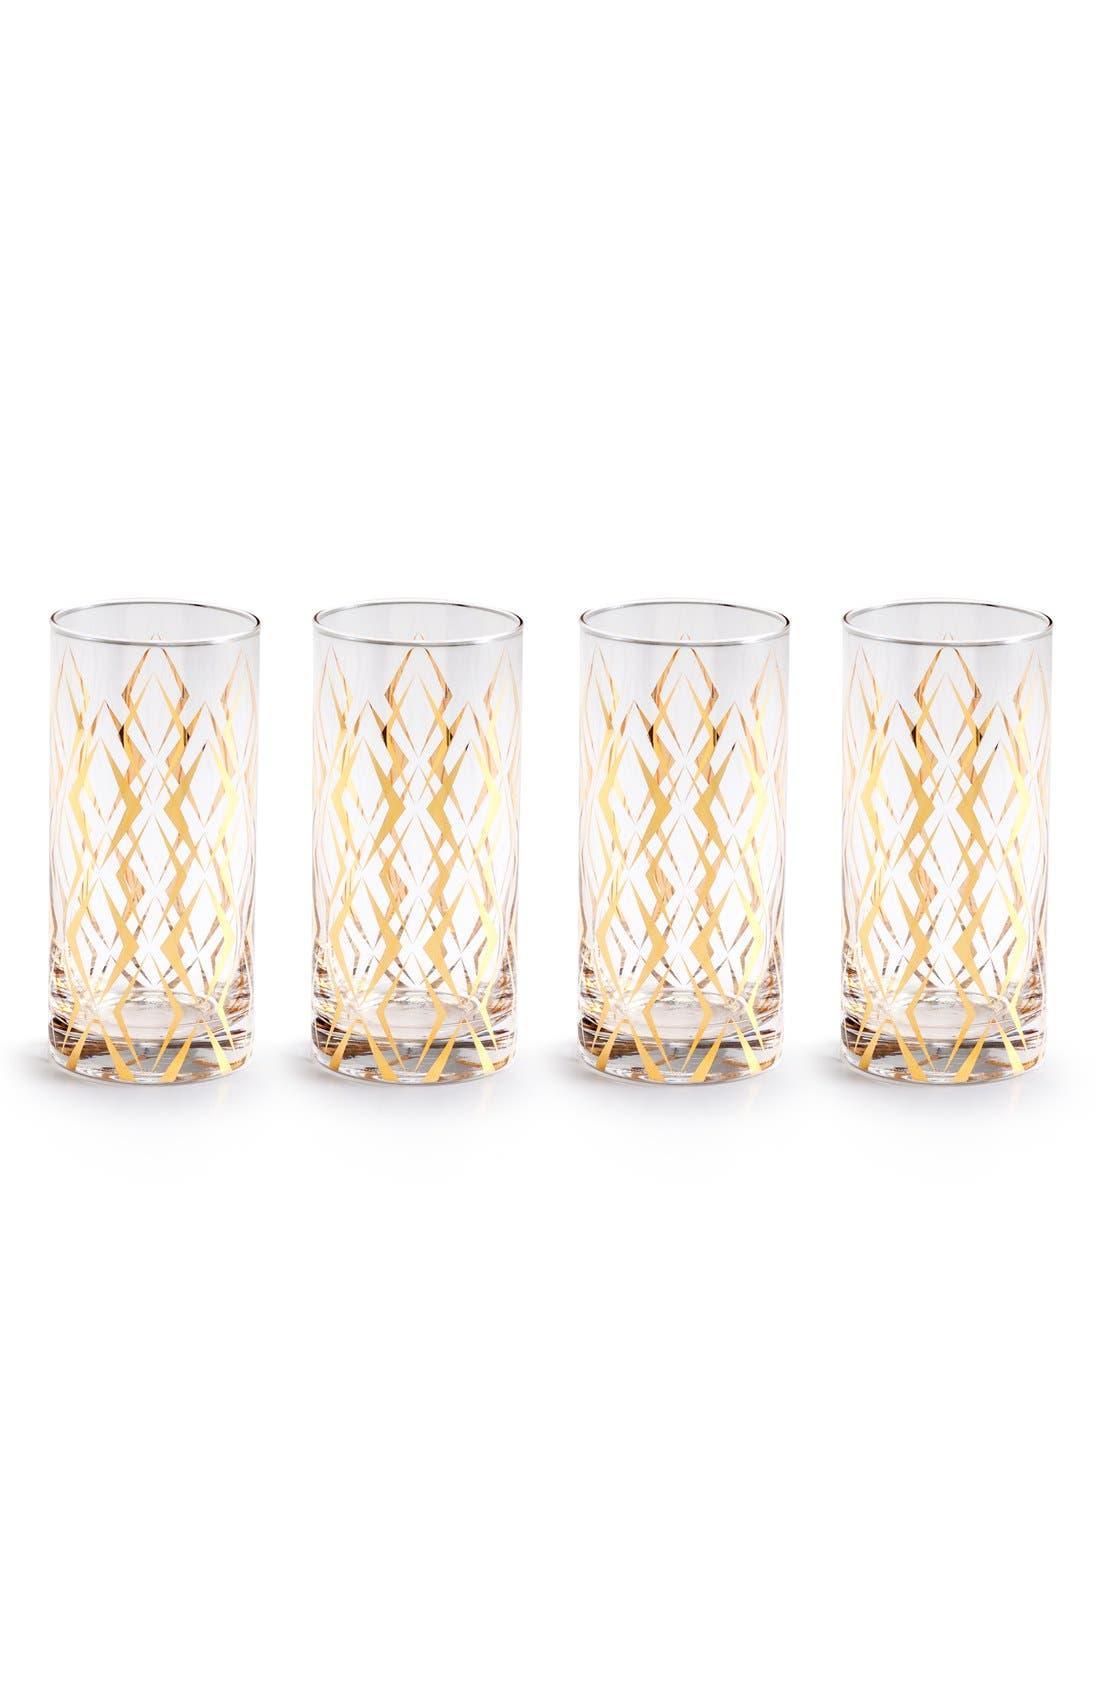 'La Cite' Highball Glasses,                         Main,                         color, White